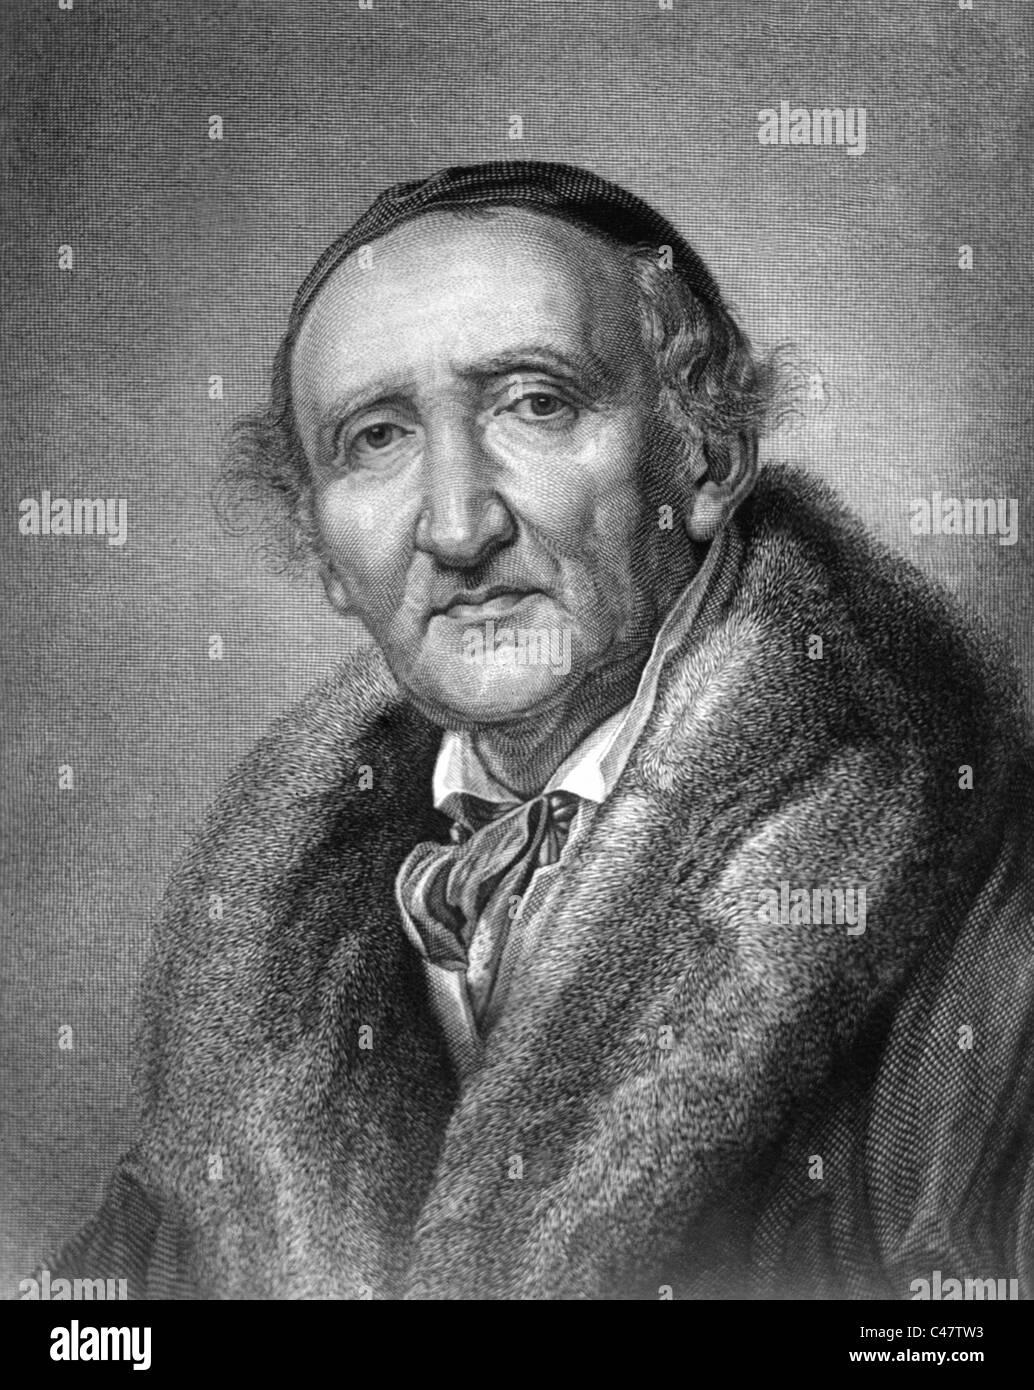 Johann Gottfried Schadow, Foto de stock